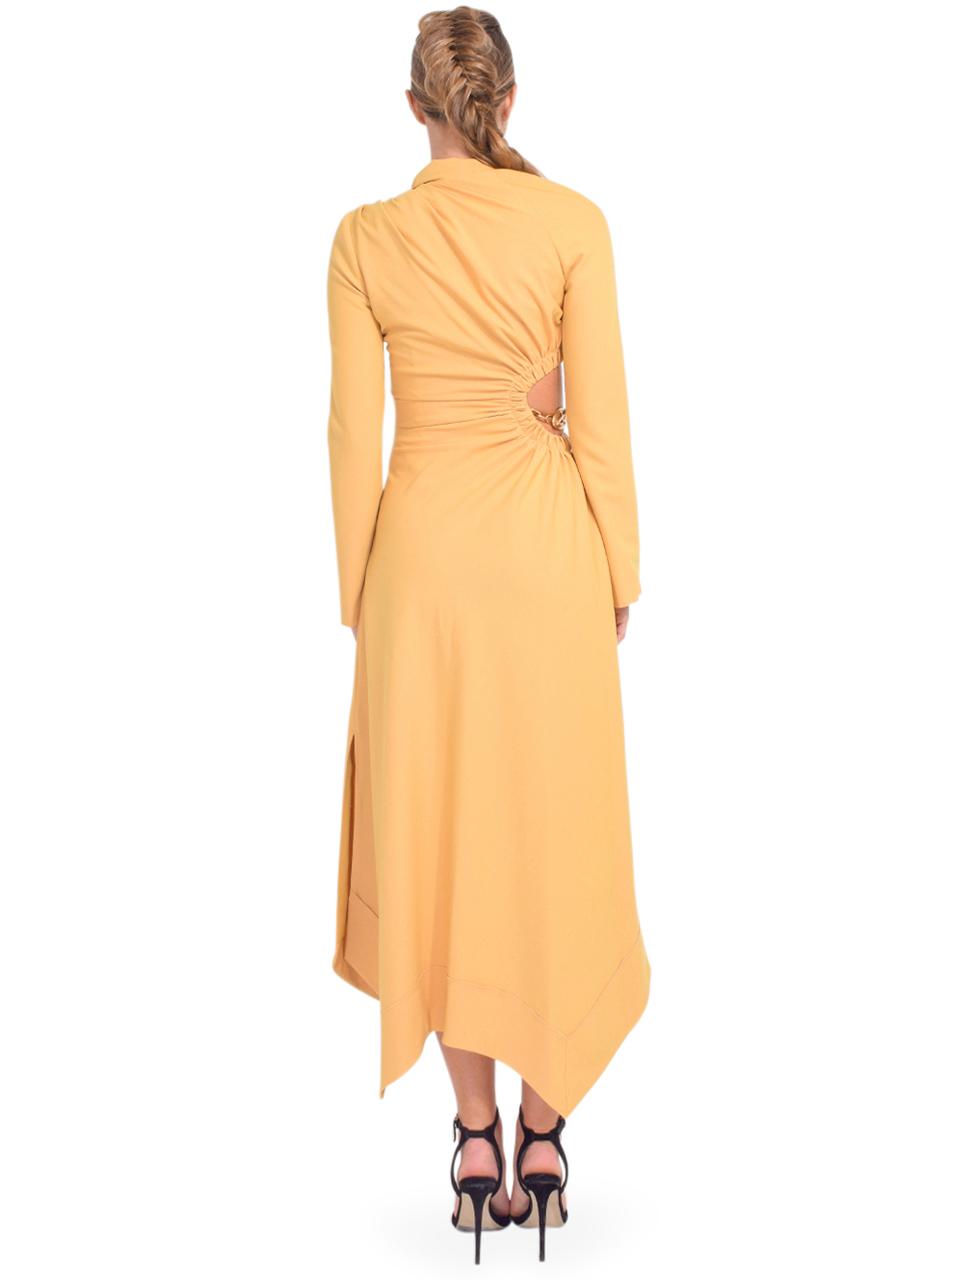 Jonathan Simkhai Christie Draped Cutout Dress in Honey Back View